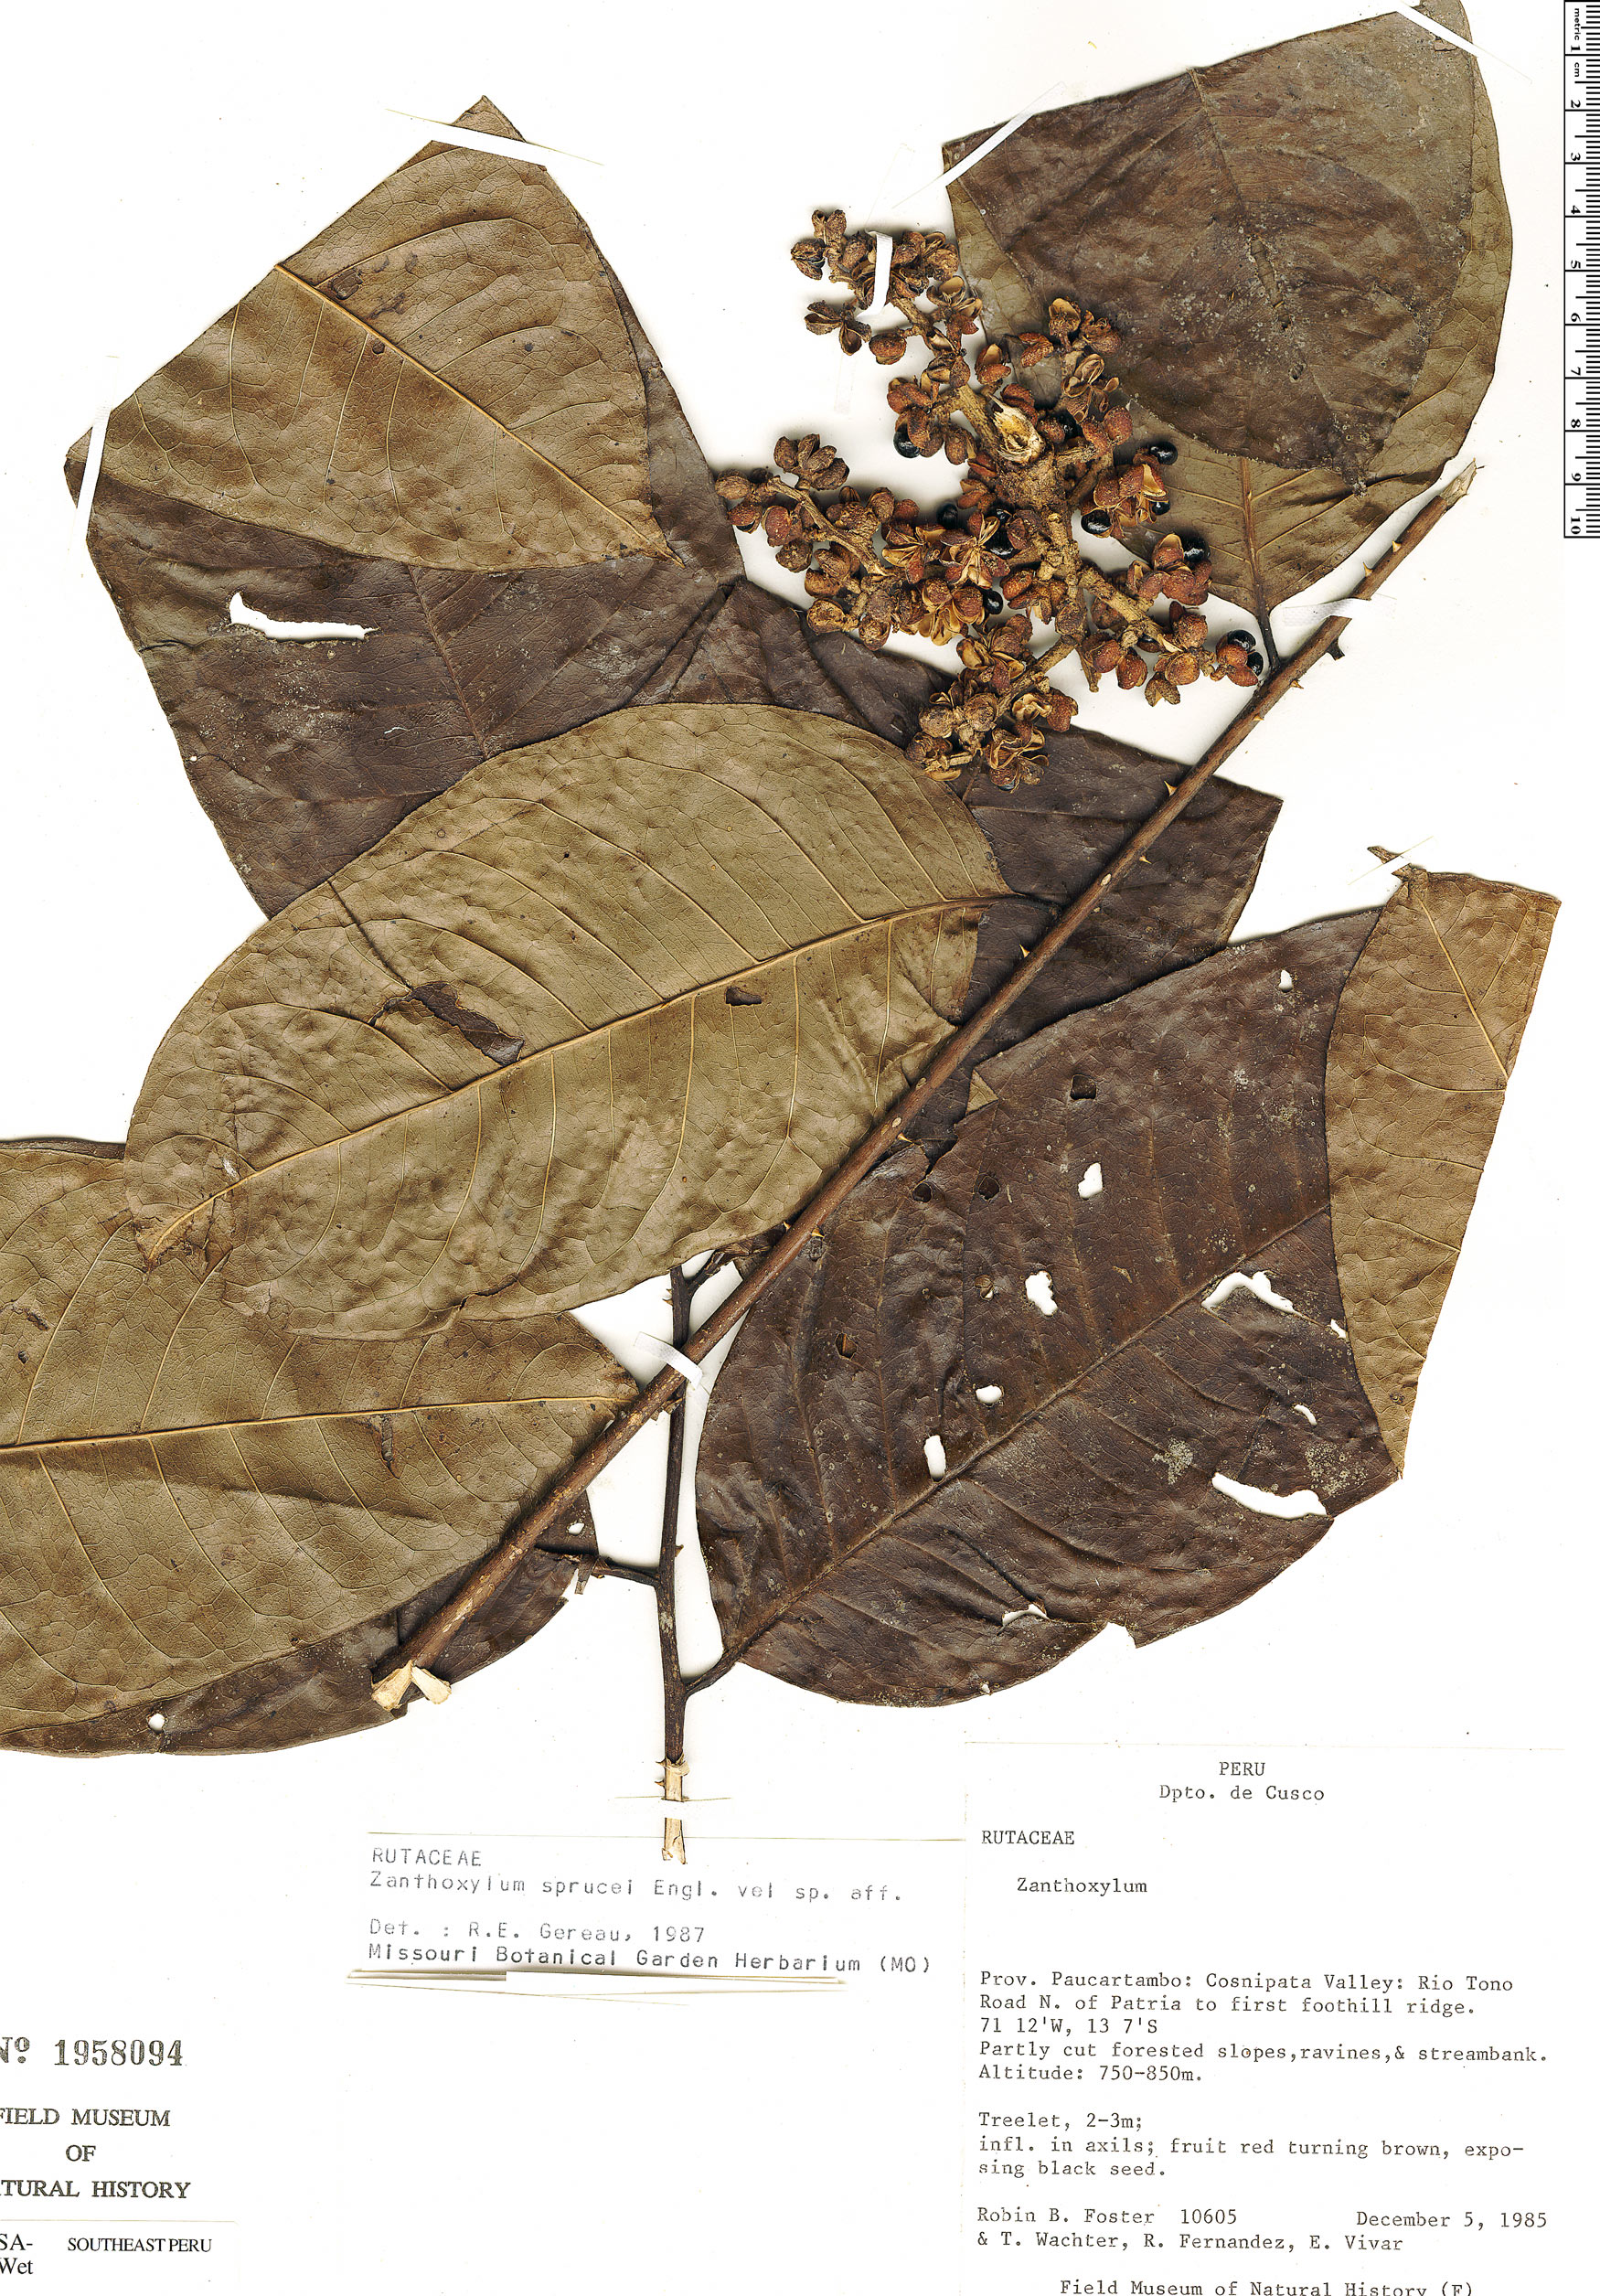 Specimen: Zanthoxylum eliasii